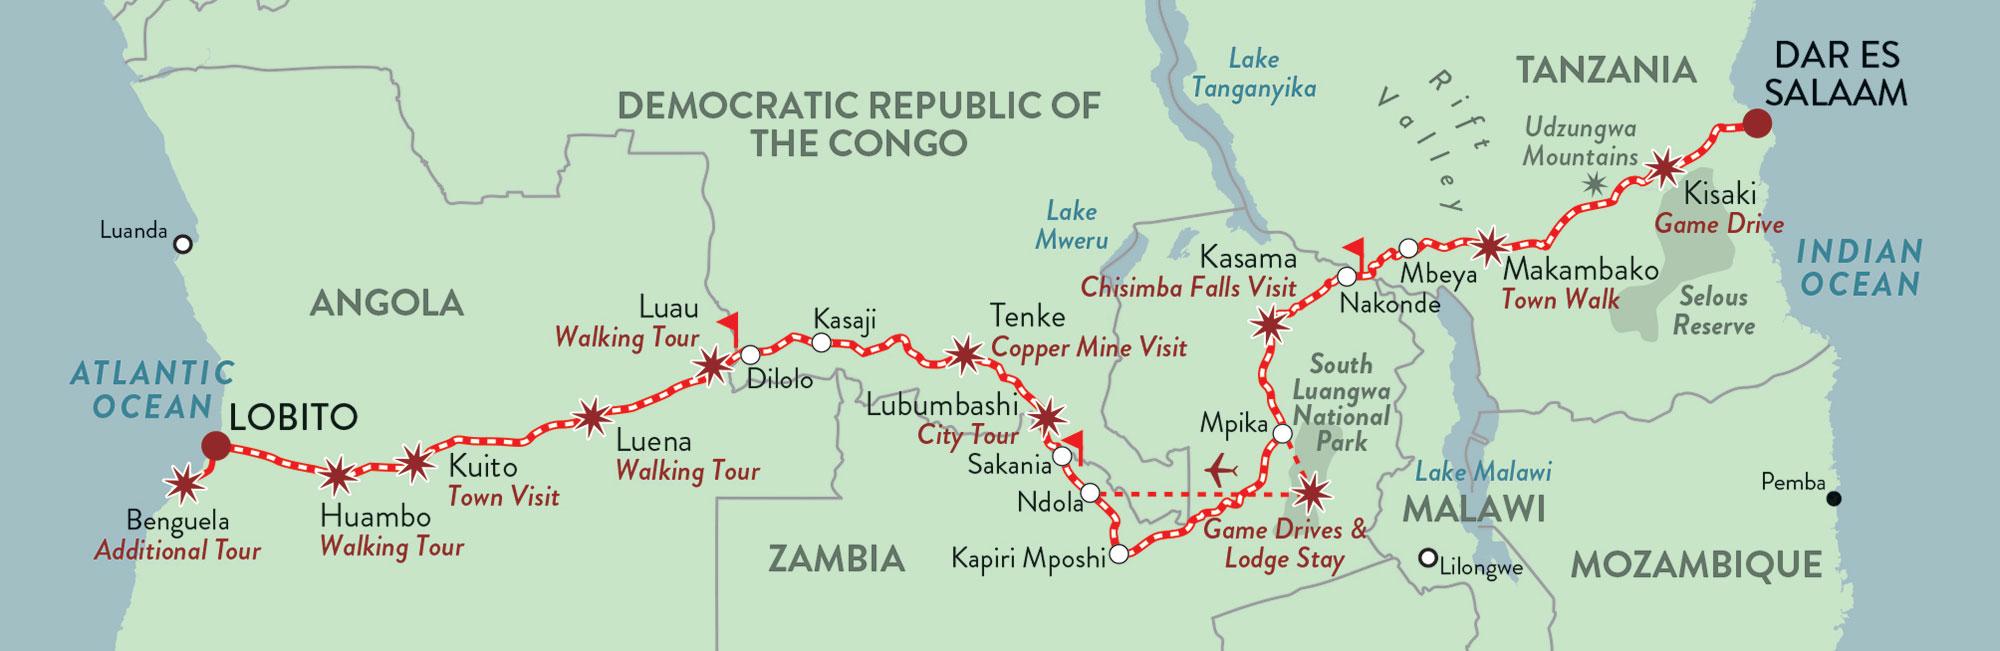 Rovos-Rail-tren-Map-Tanzania-Angola